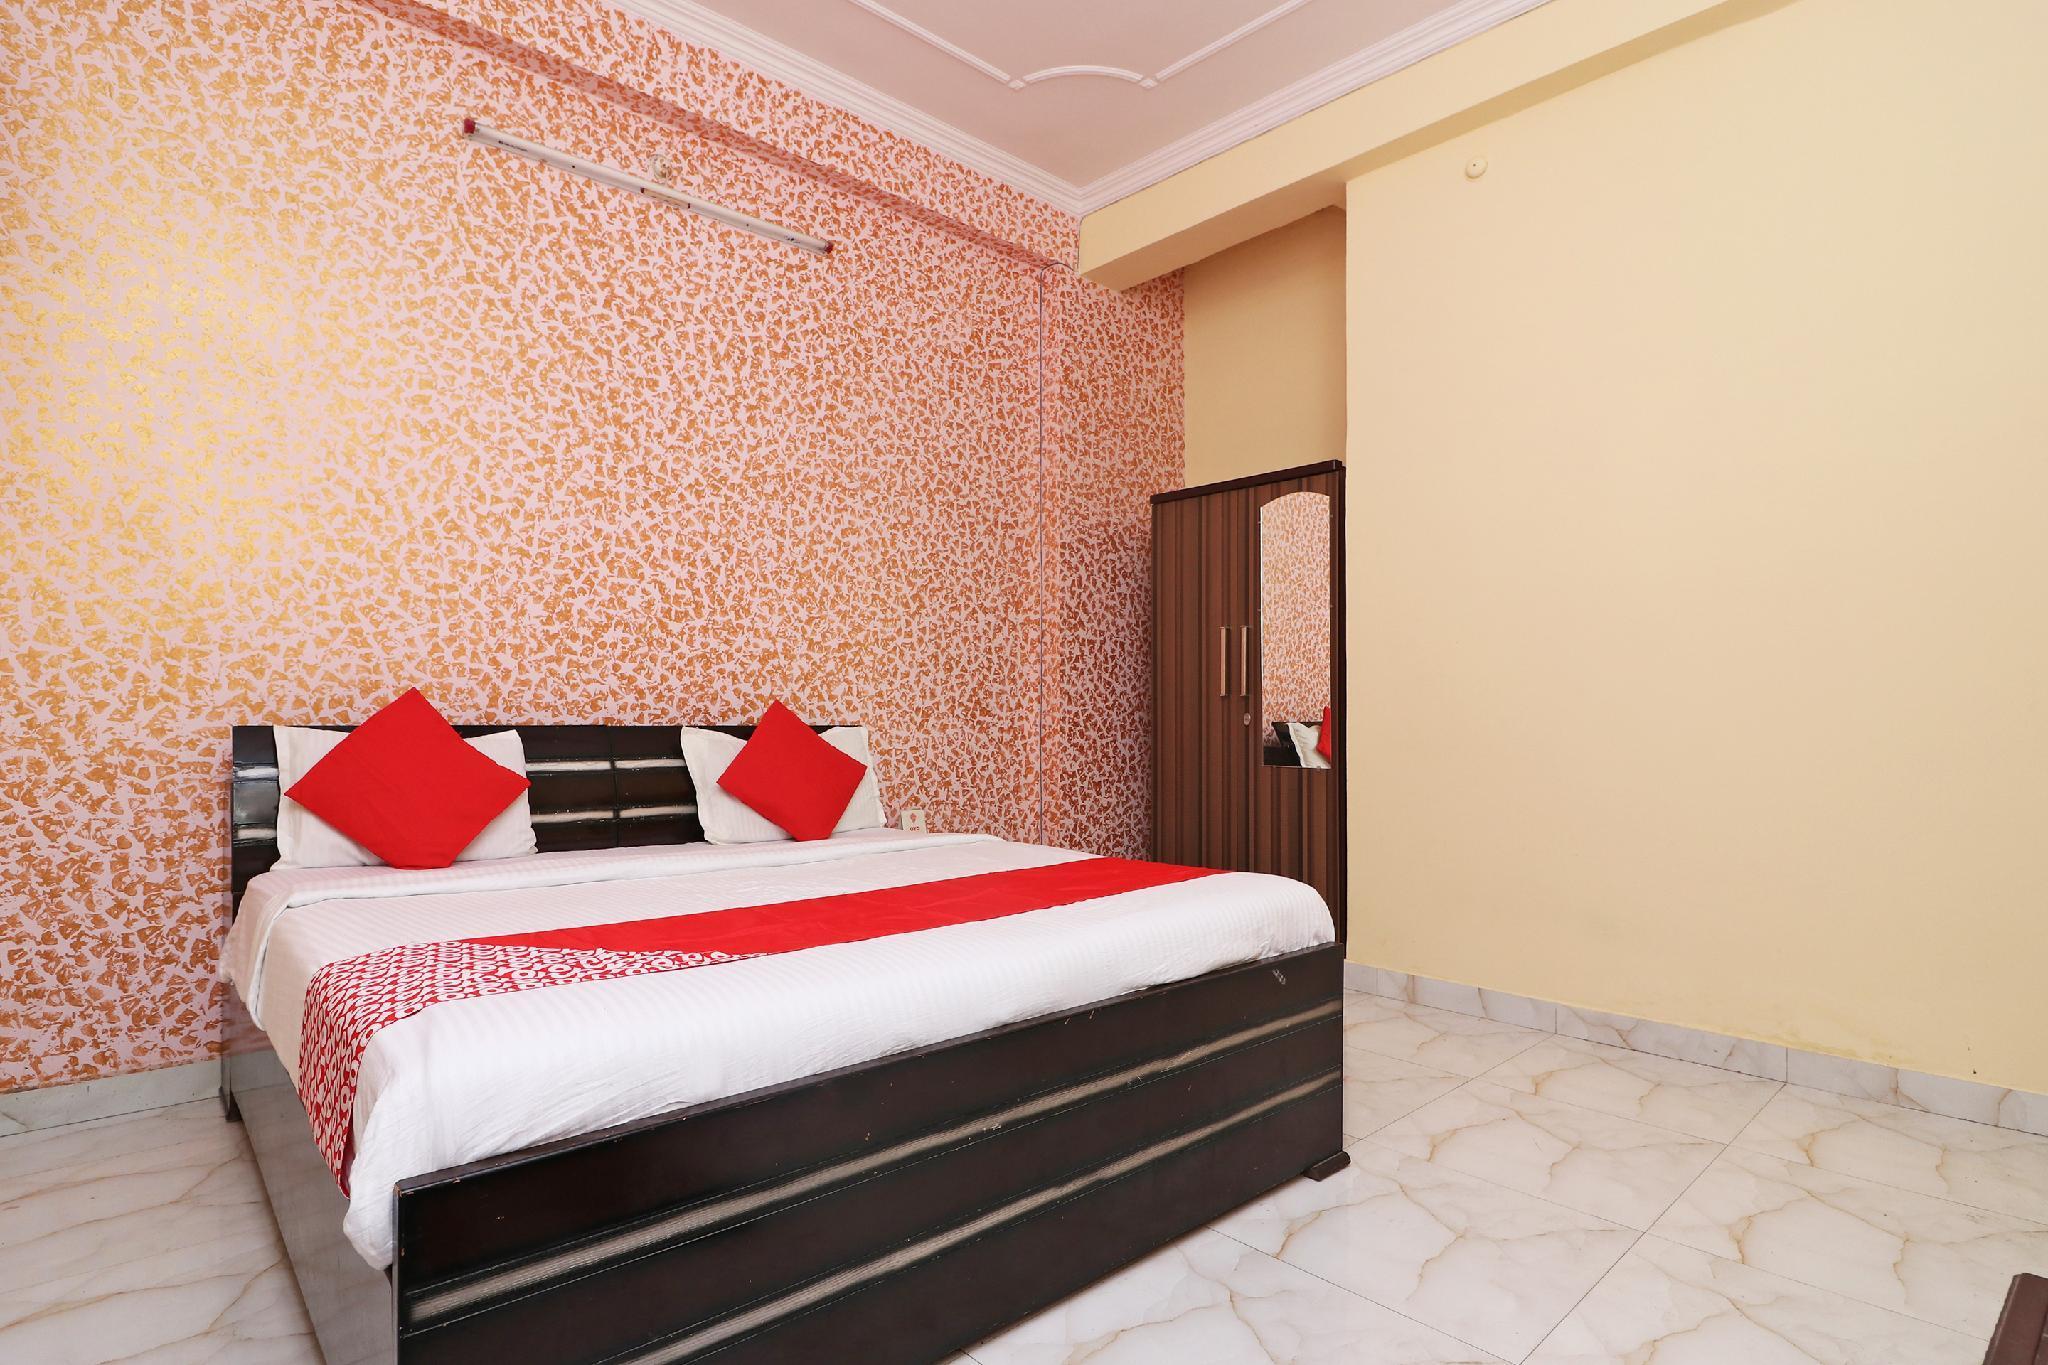 OYO 7441 Gomti Nagar